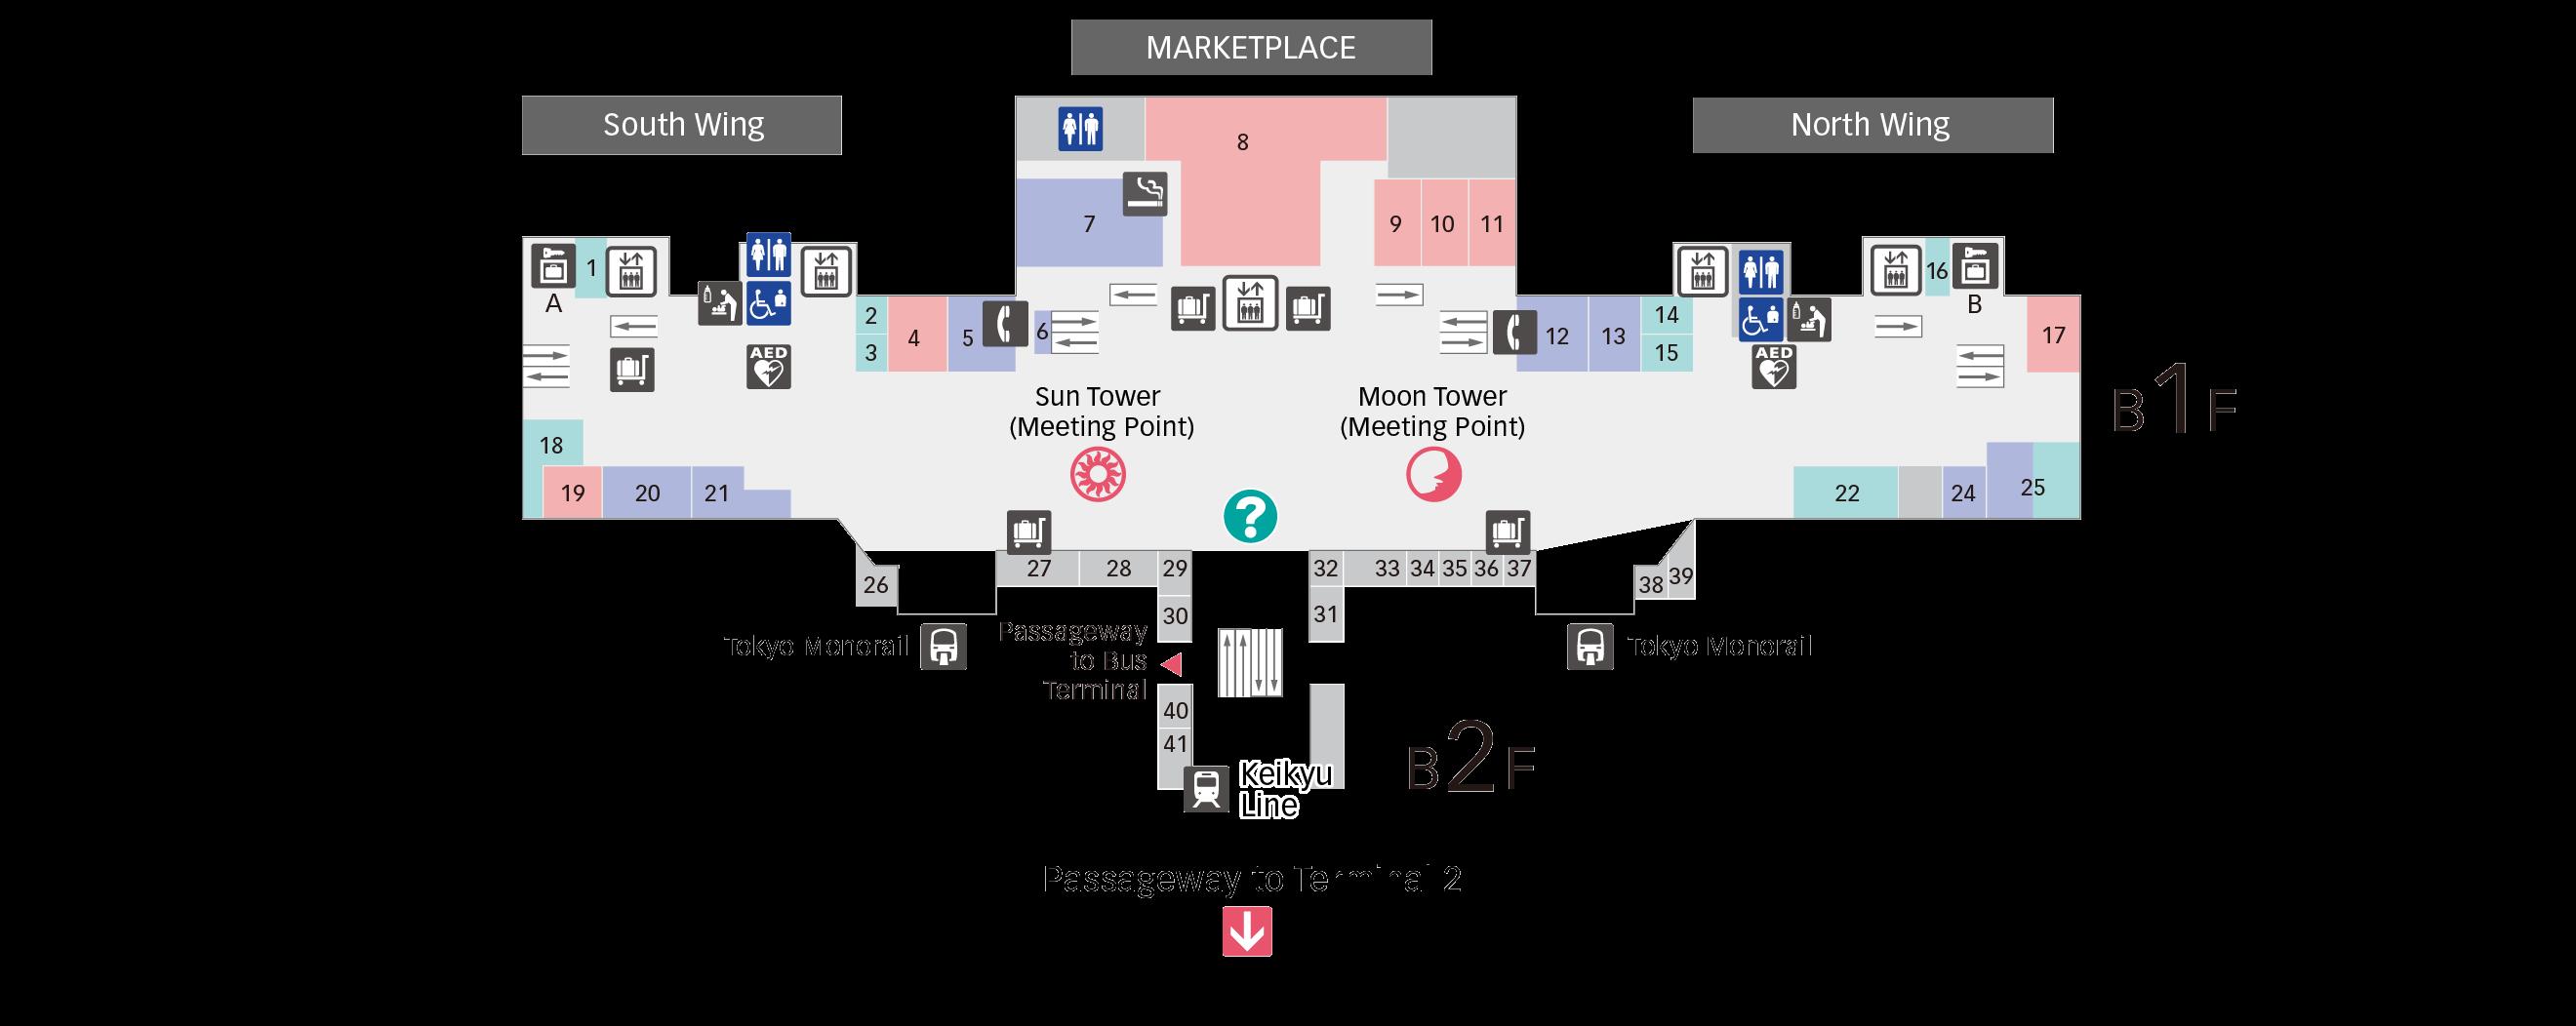 B1F Keikyu Line/Tokyo Monorail Floor Map